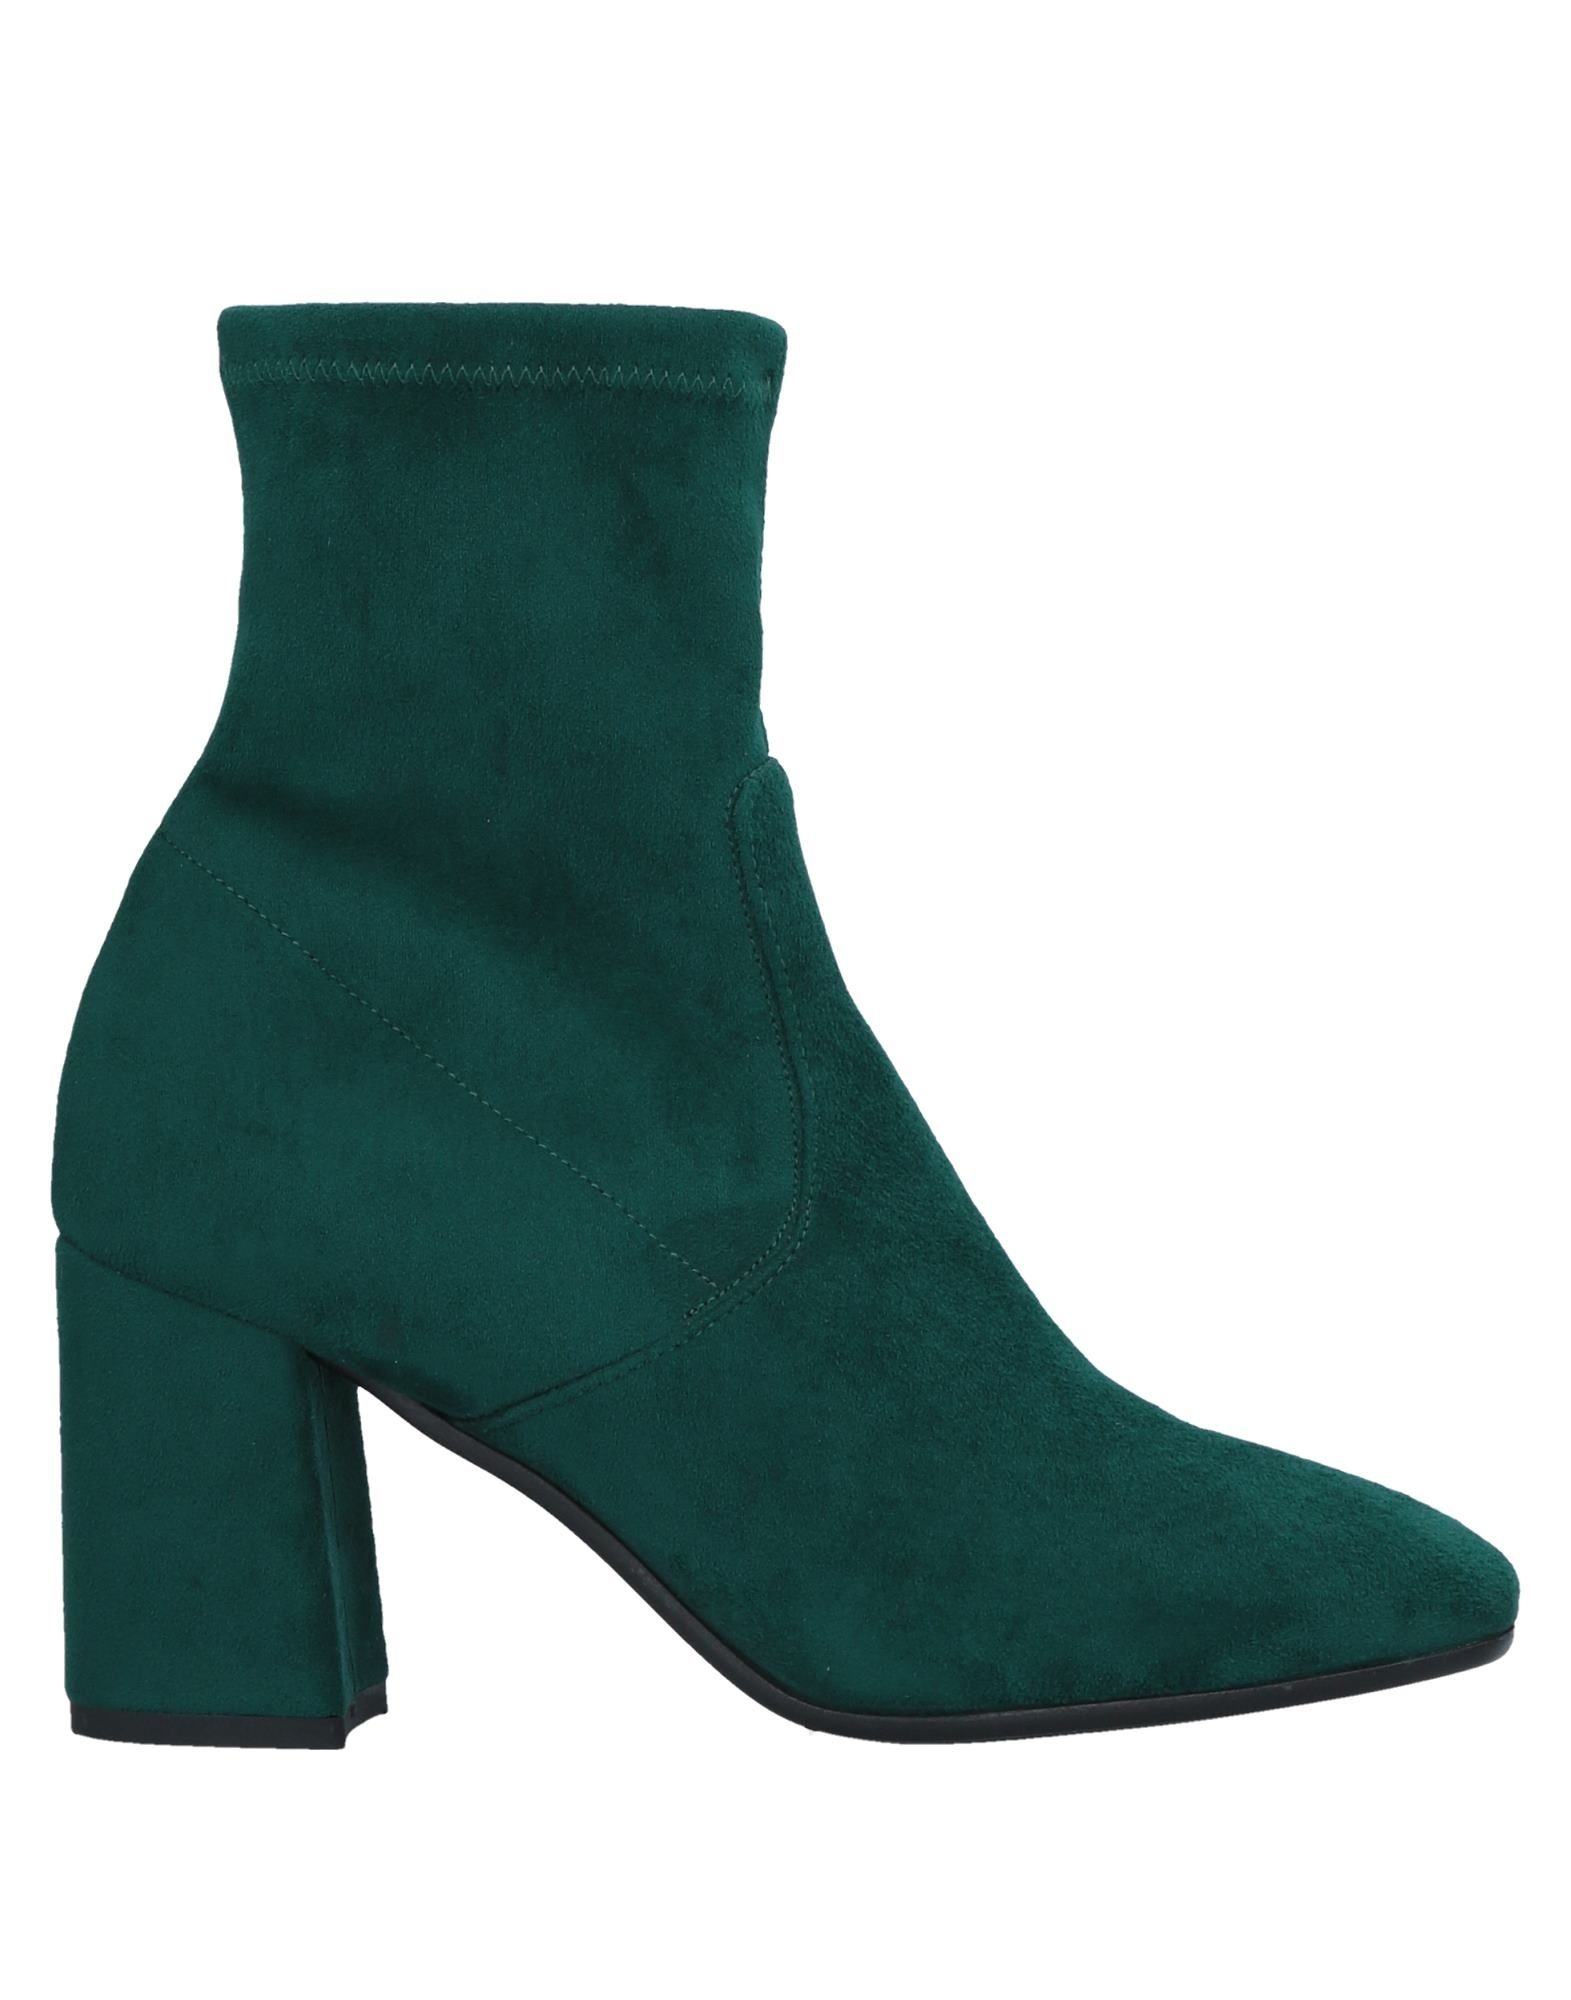 Gut um billige Schuhe Damen zu tragenLe Pepite Stiefelette Damen Schuhe  11526835UQ 6c07b3